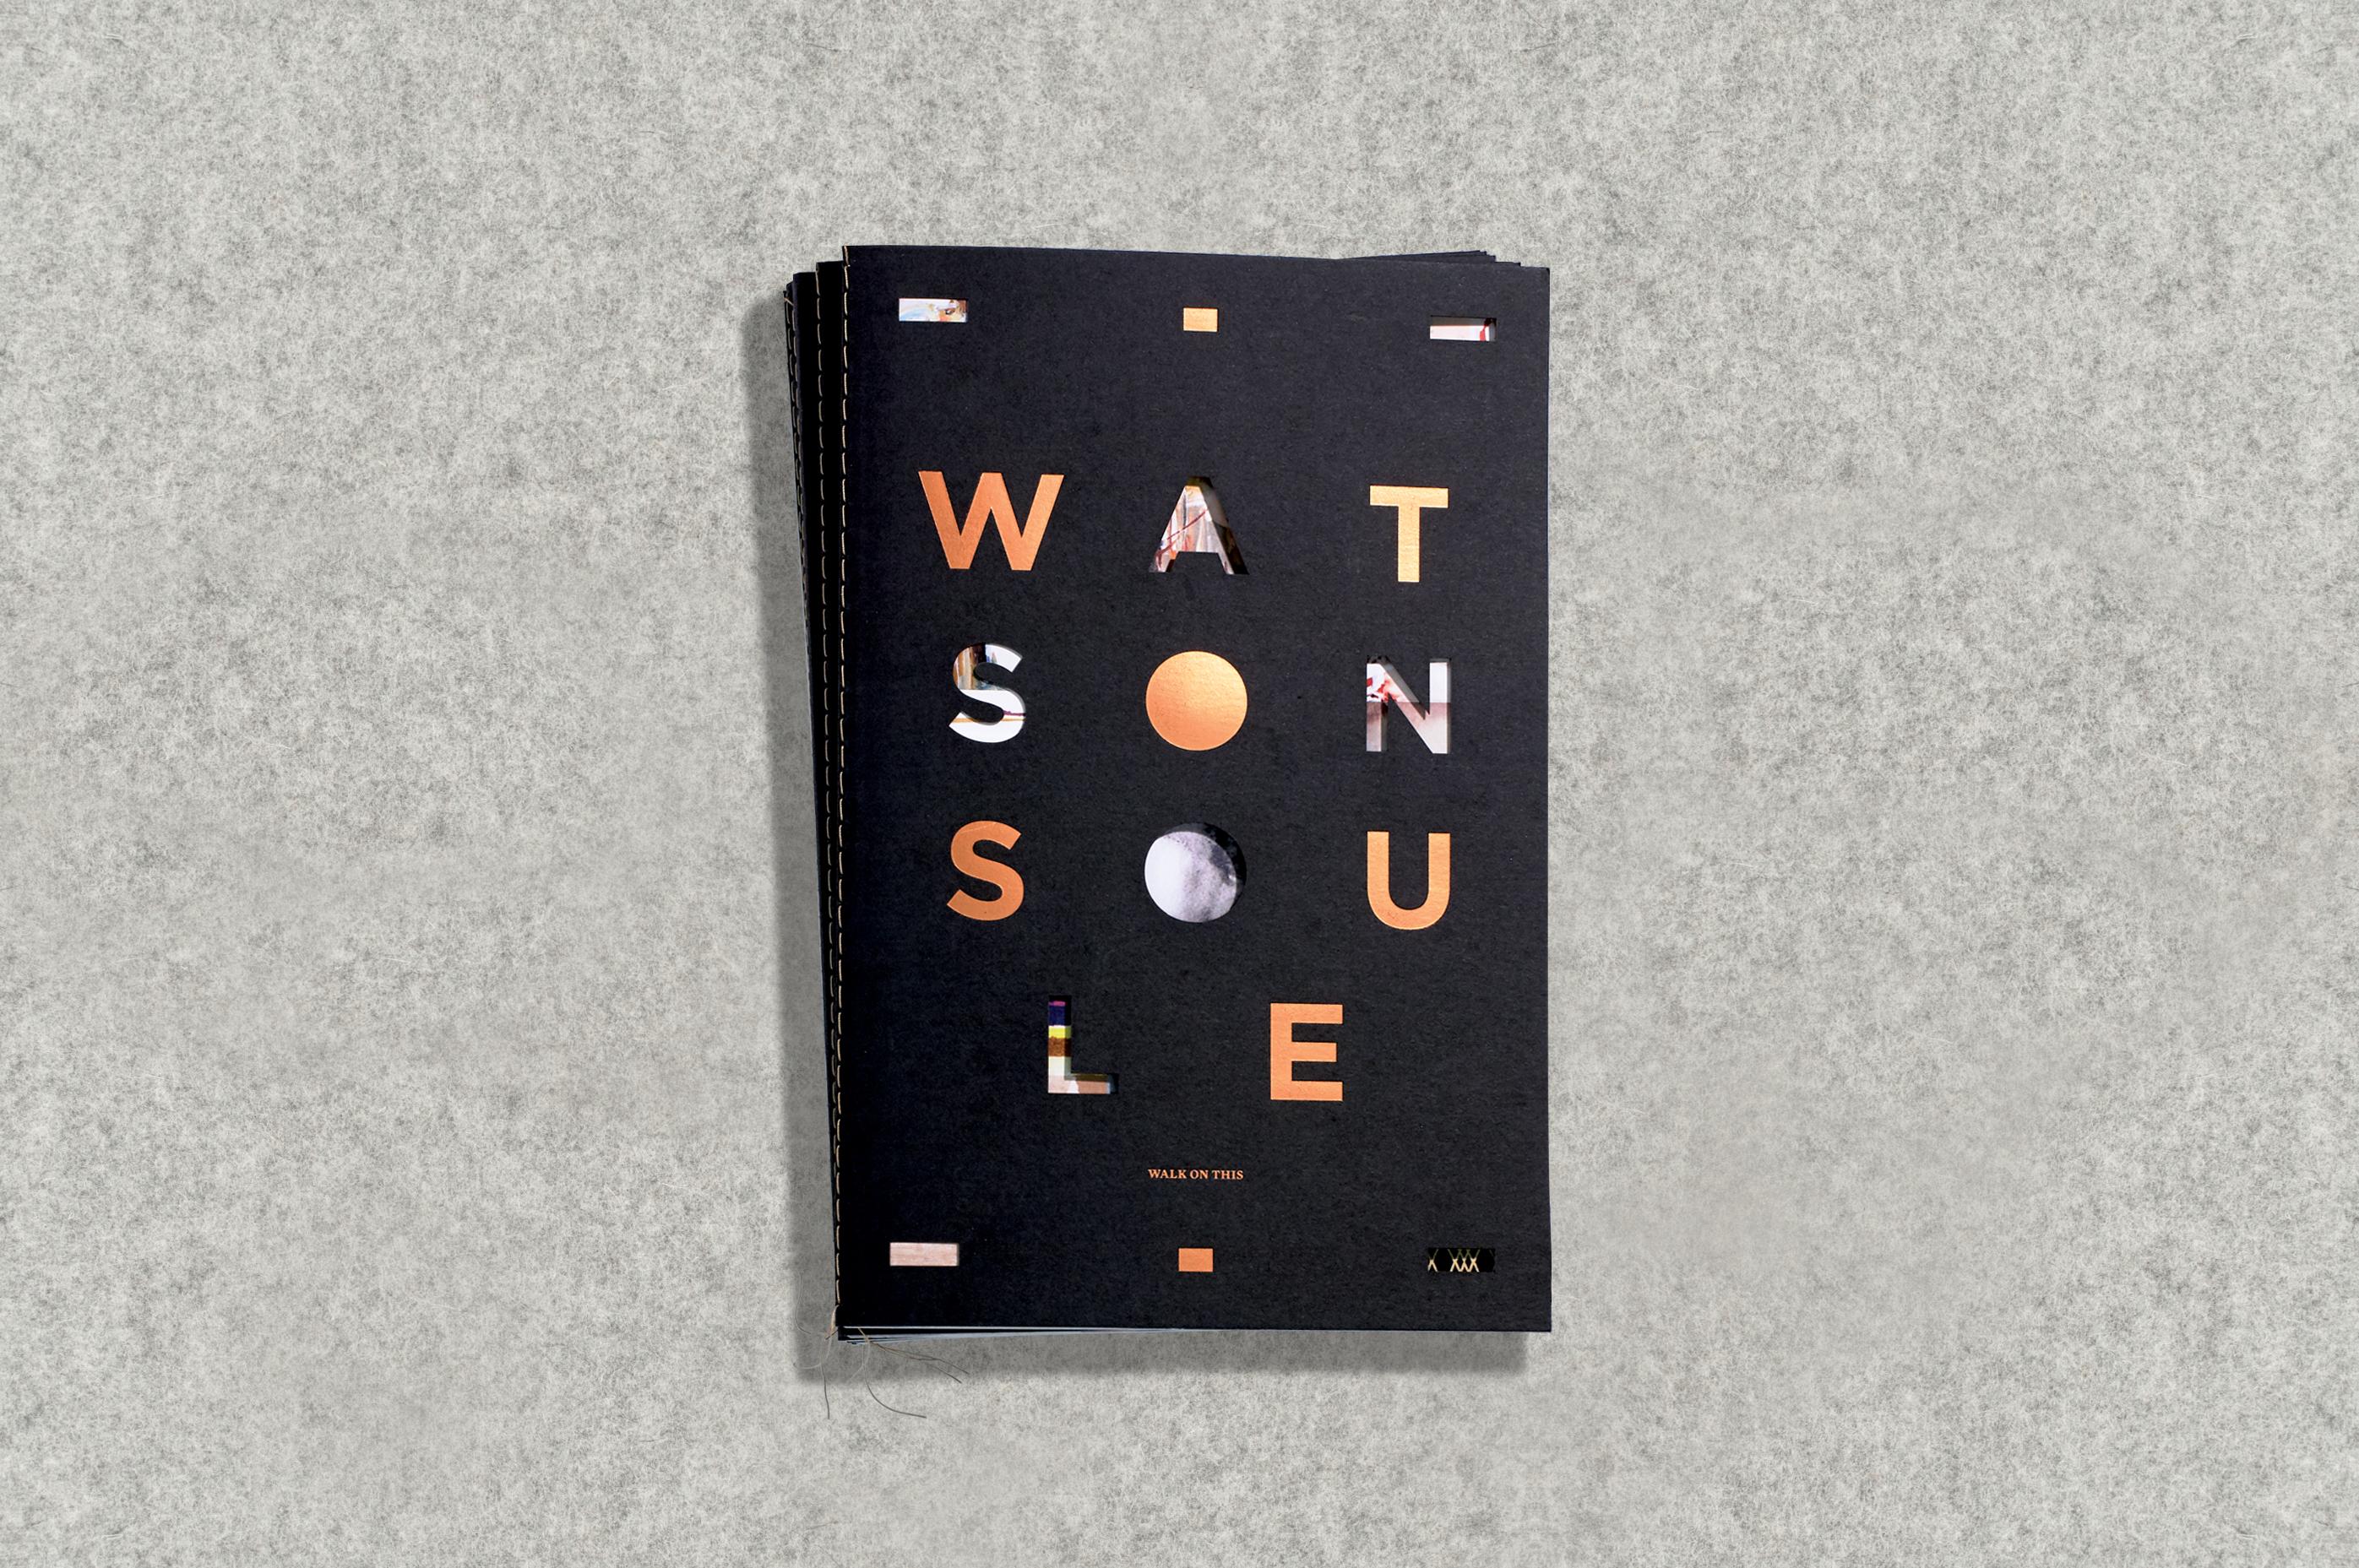 TWR_WatsonSoule_Book_FrontCover_Mockup_v2